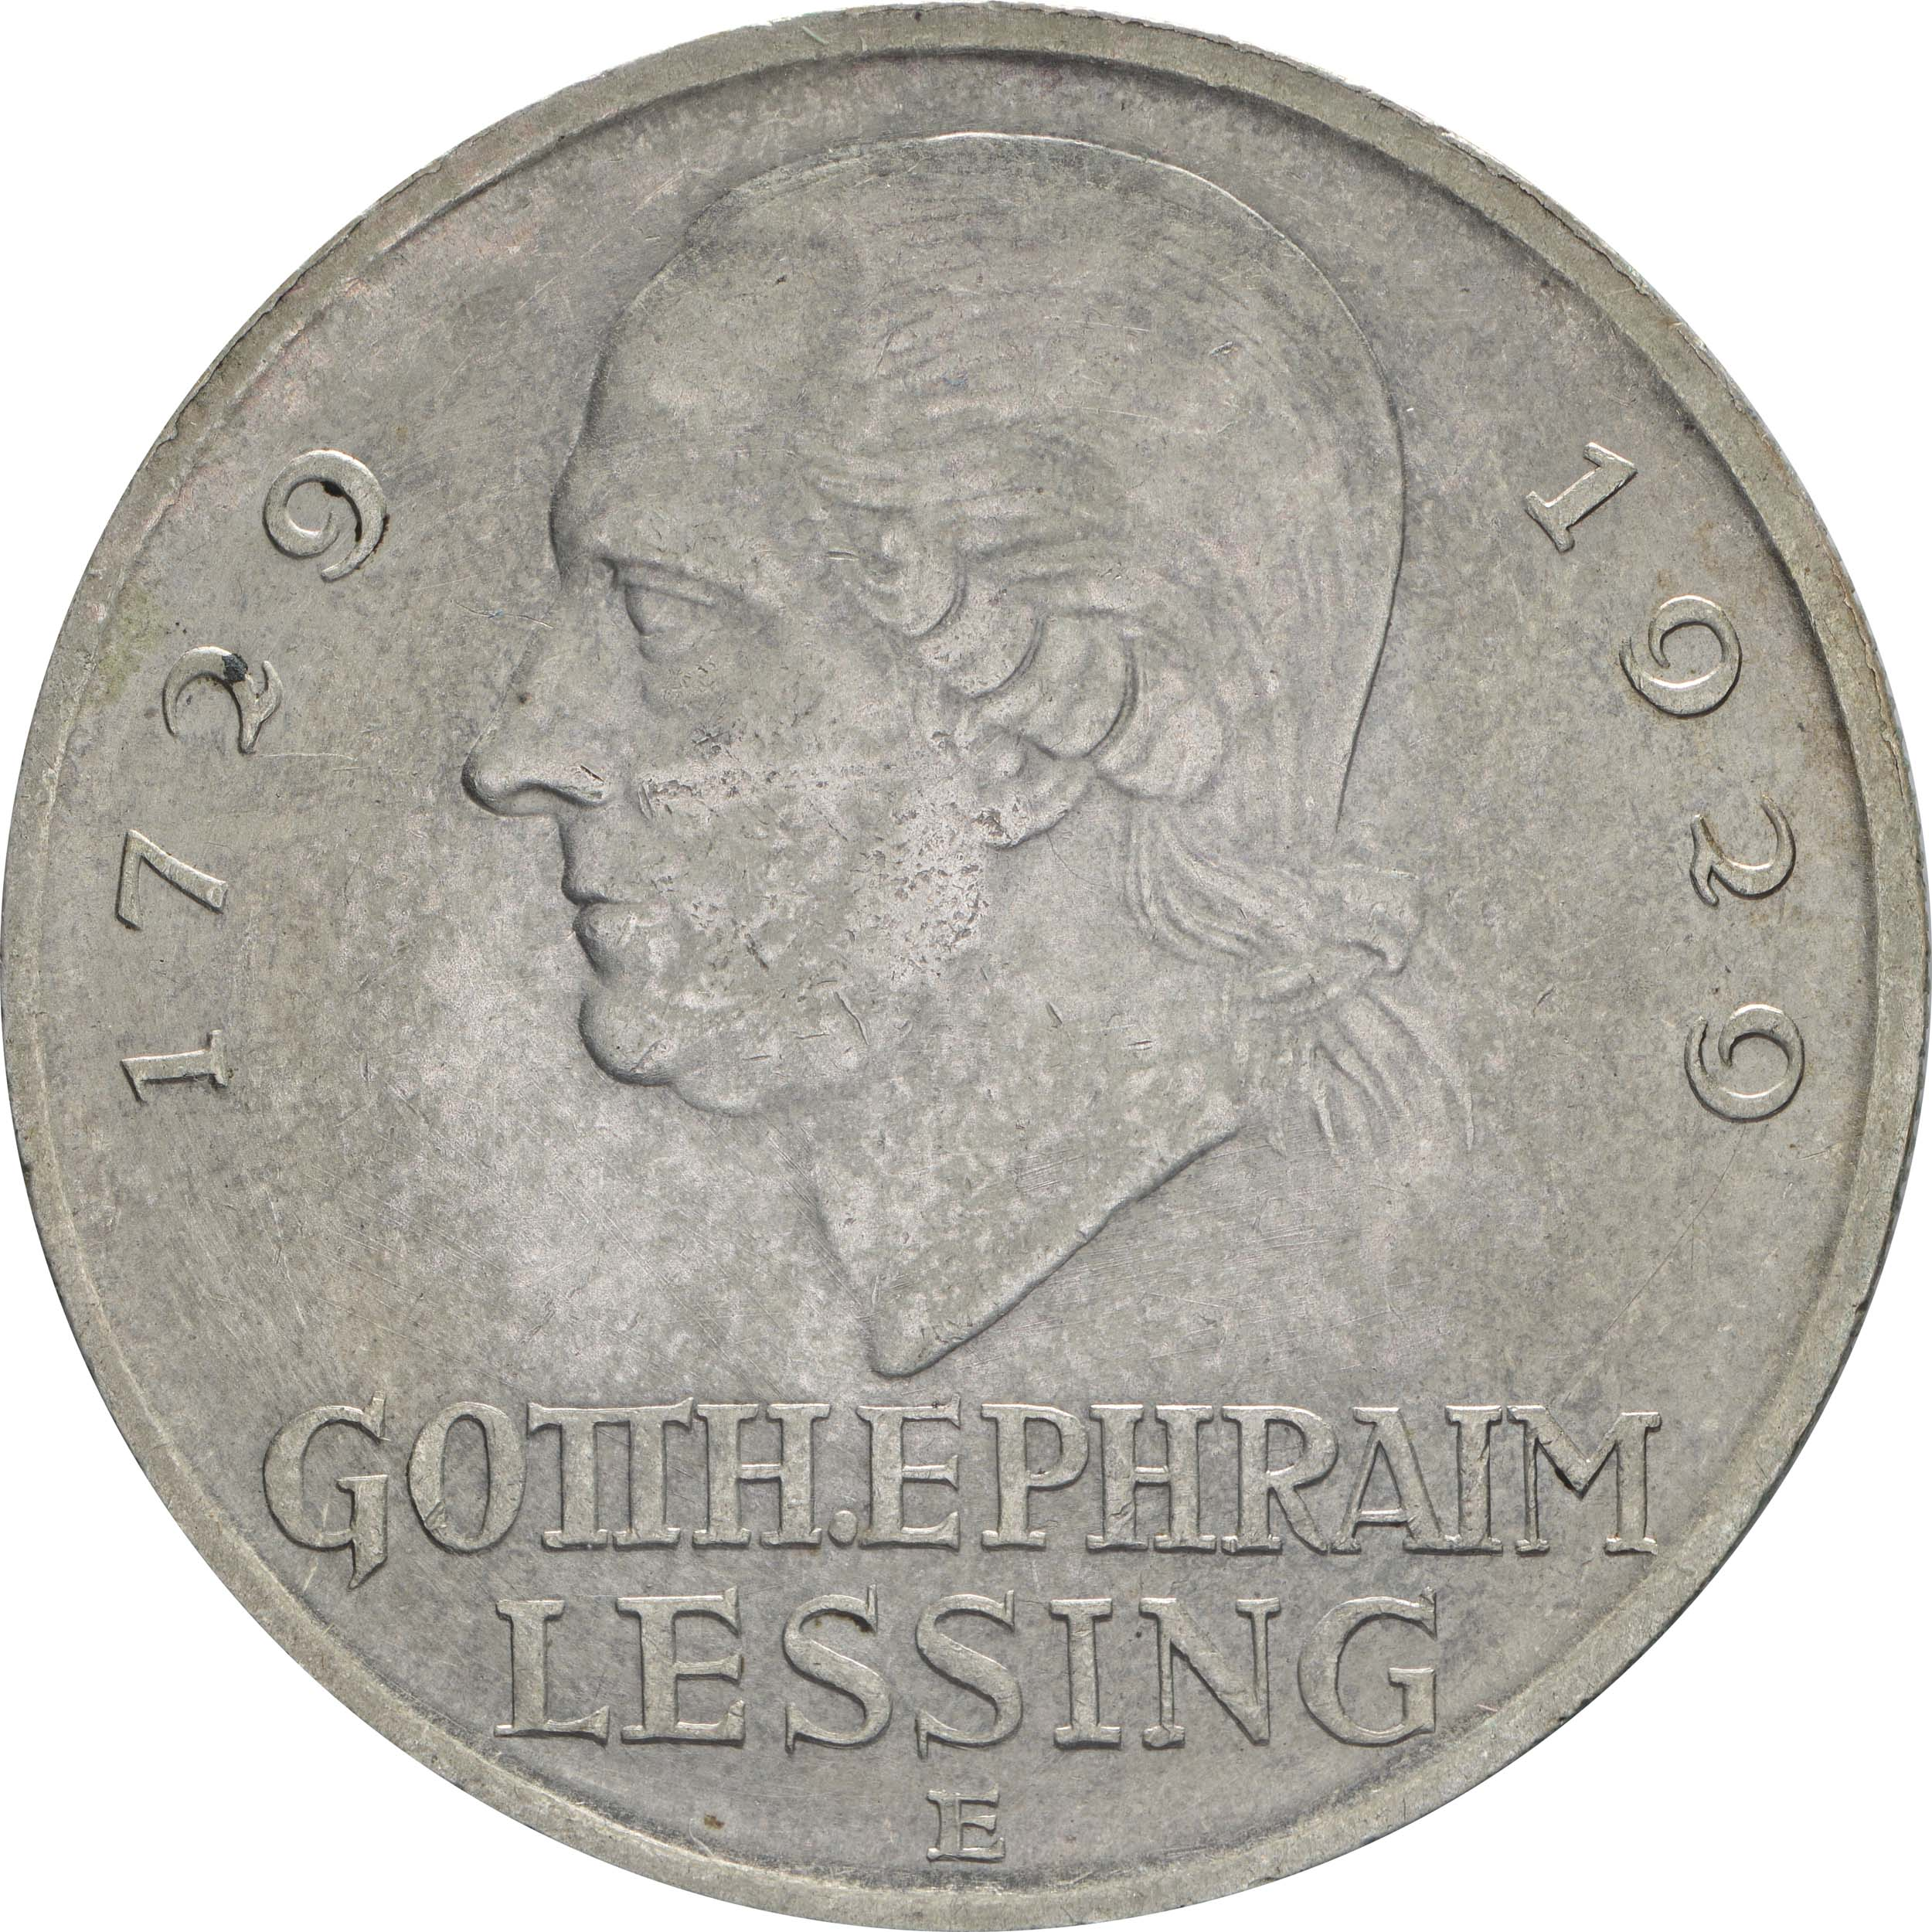 deutschland 5 reichsmark lessing 1929 e silber vz stgl 229 5 euro. Black Bedroom Furniture Sets. Home Design Ideas